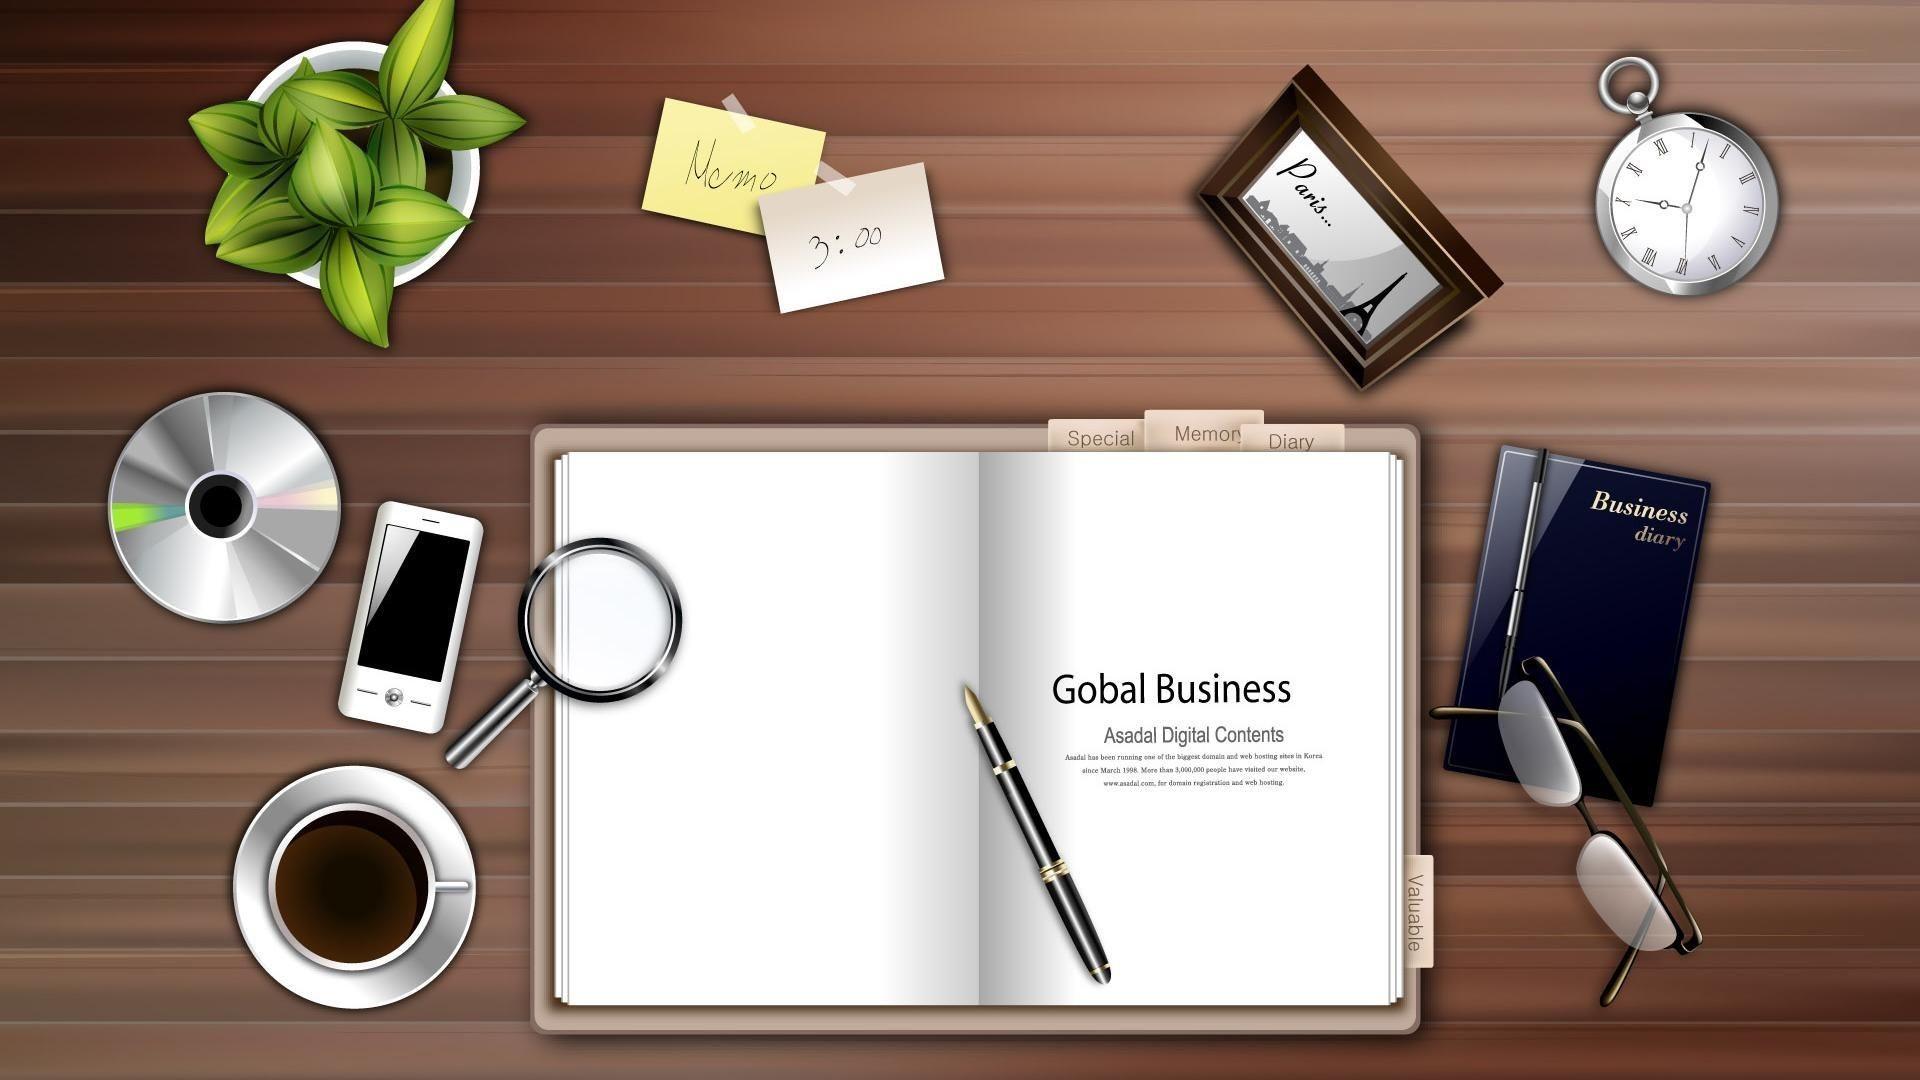 Office Desktop Background – HD Wallpapers Lovely